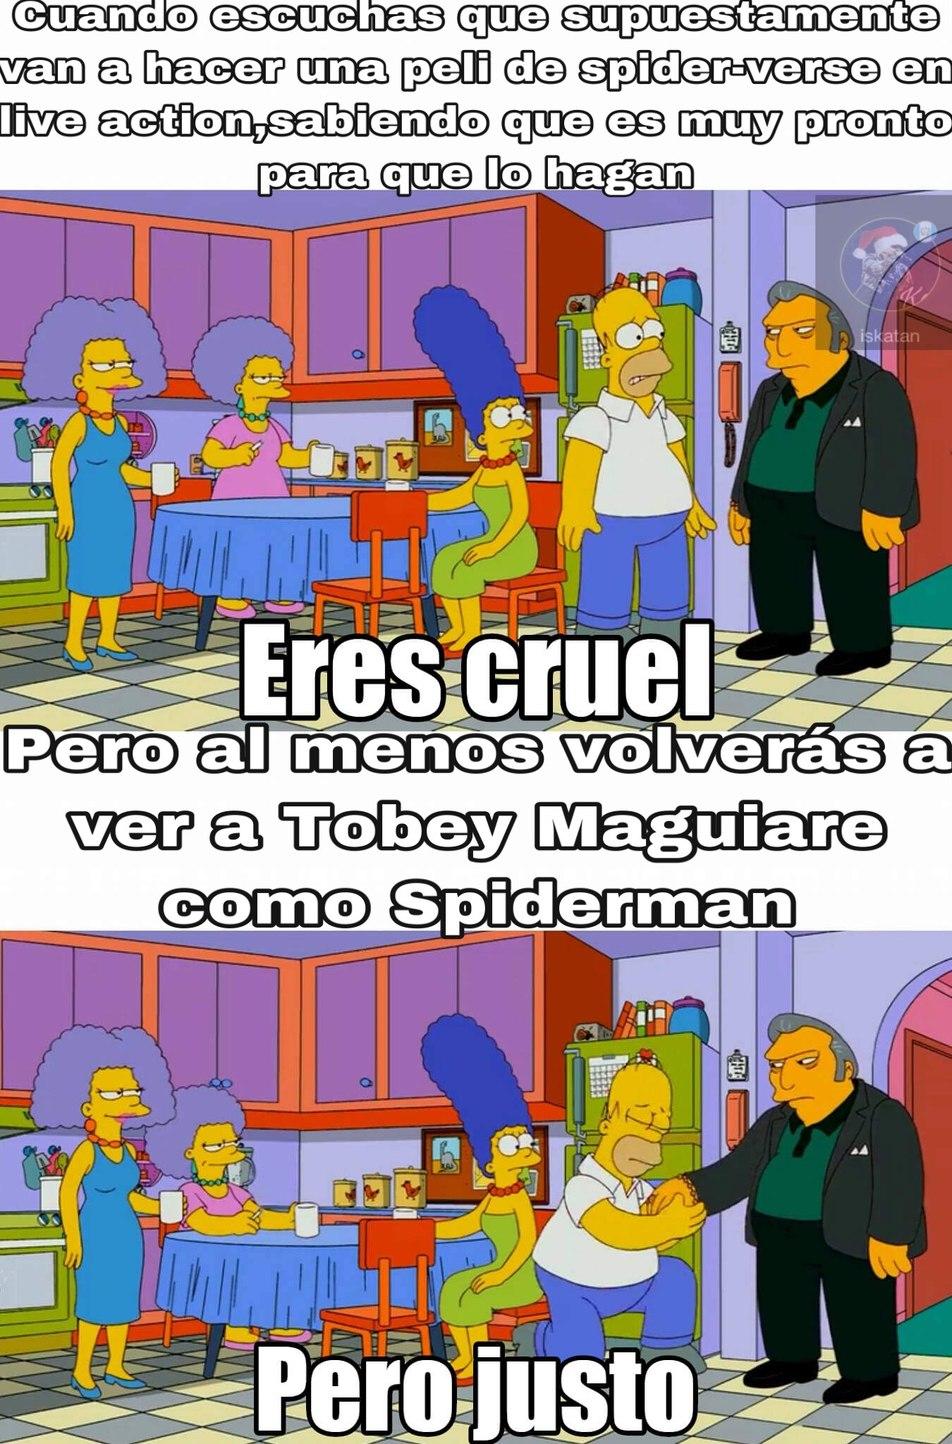 Viva Maguiare - meme